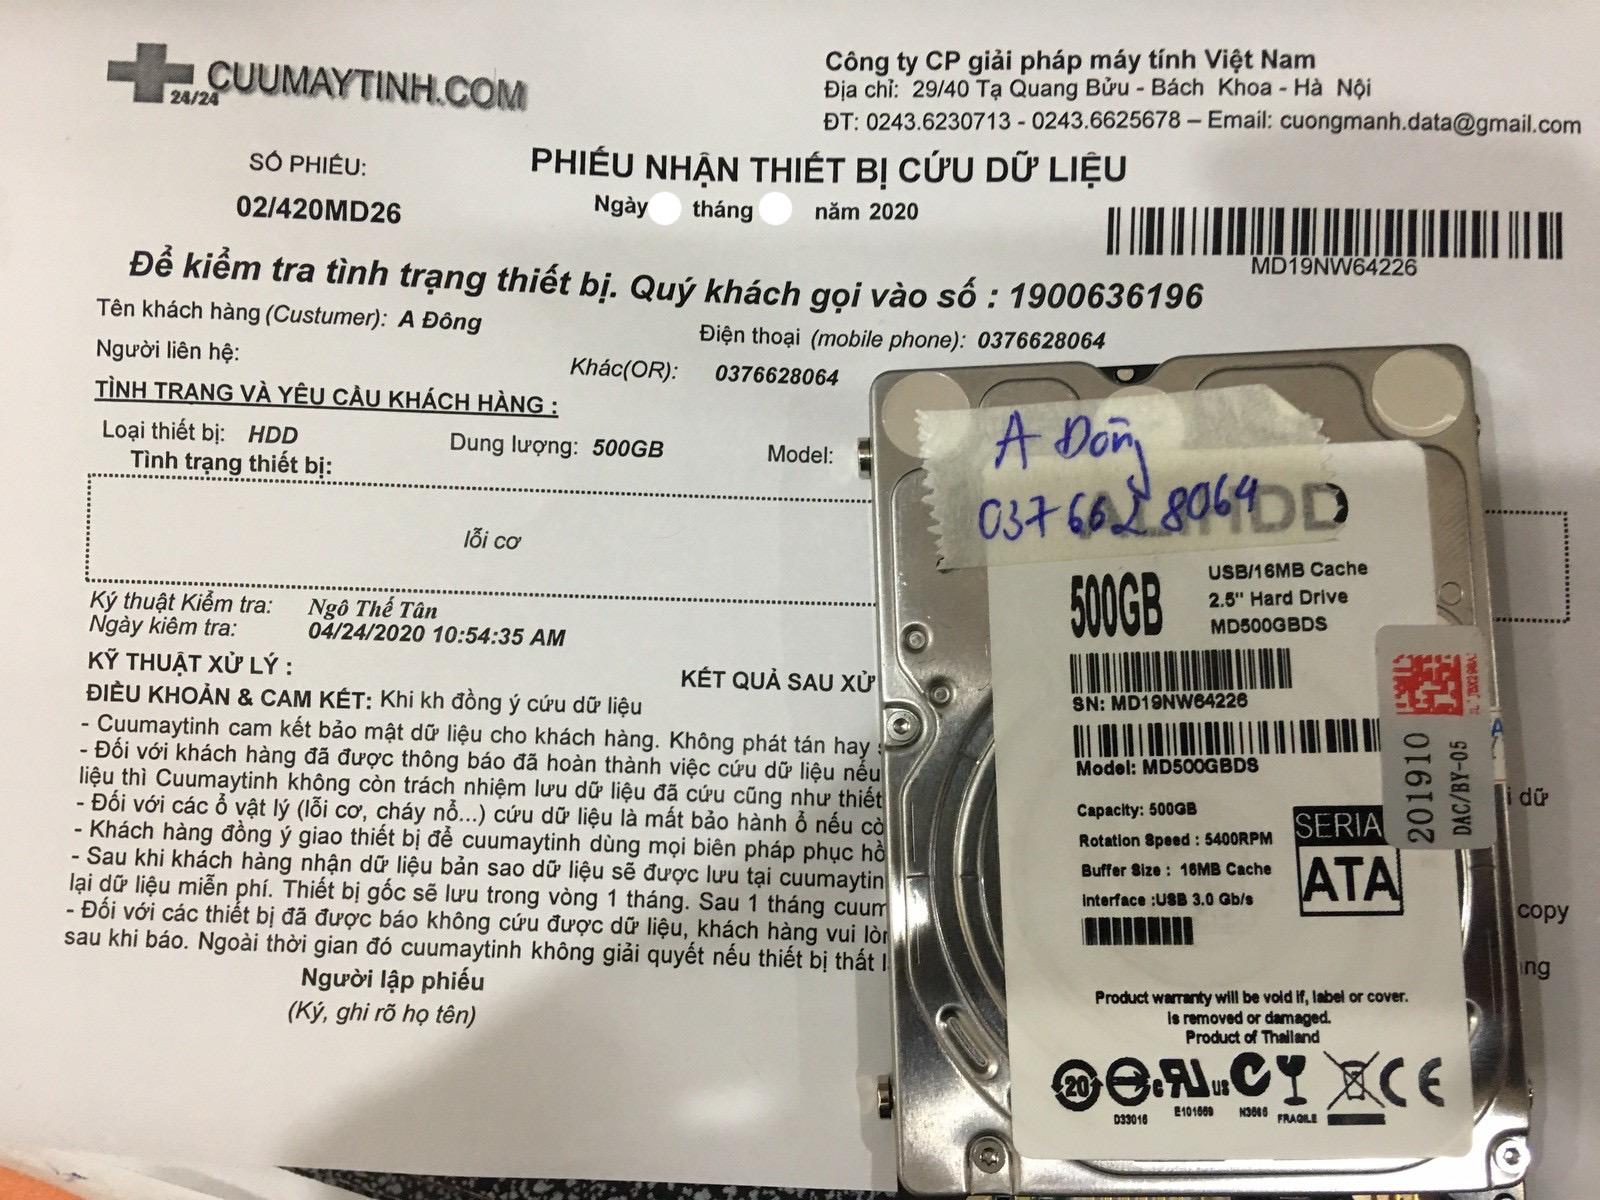 Lấy dữ liệu ổ cứng HDD 500GB lỗi cơ 07/05/2020 - cuumaytinh